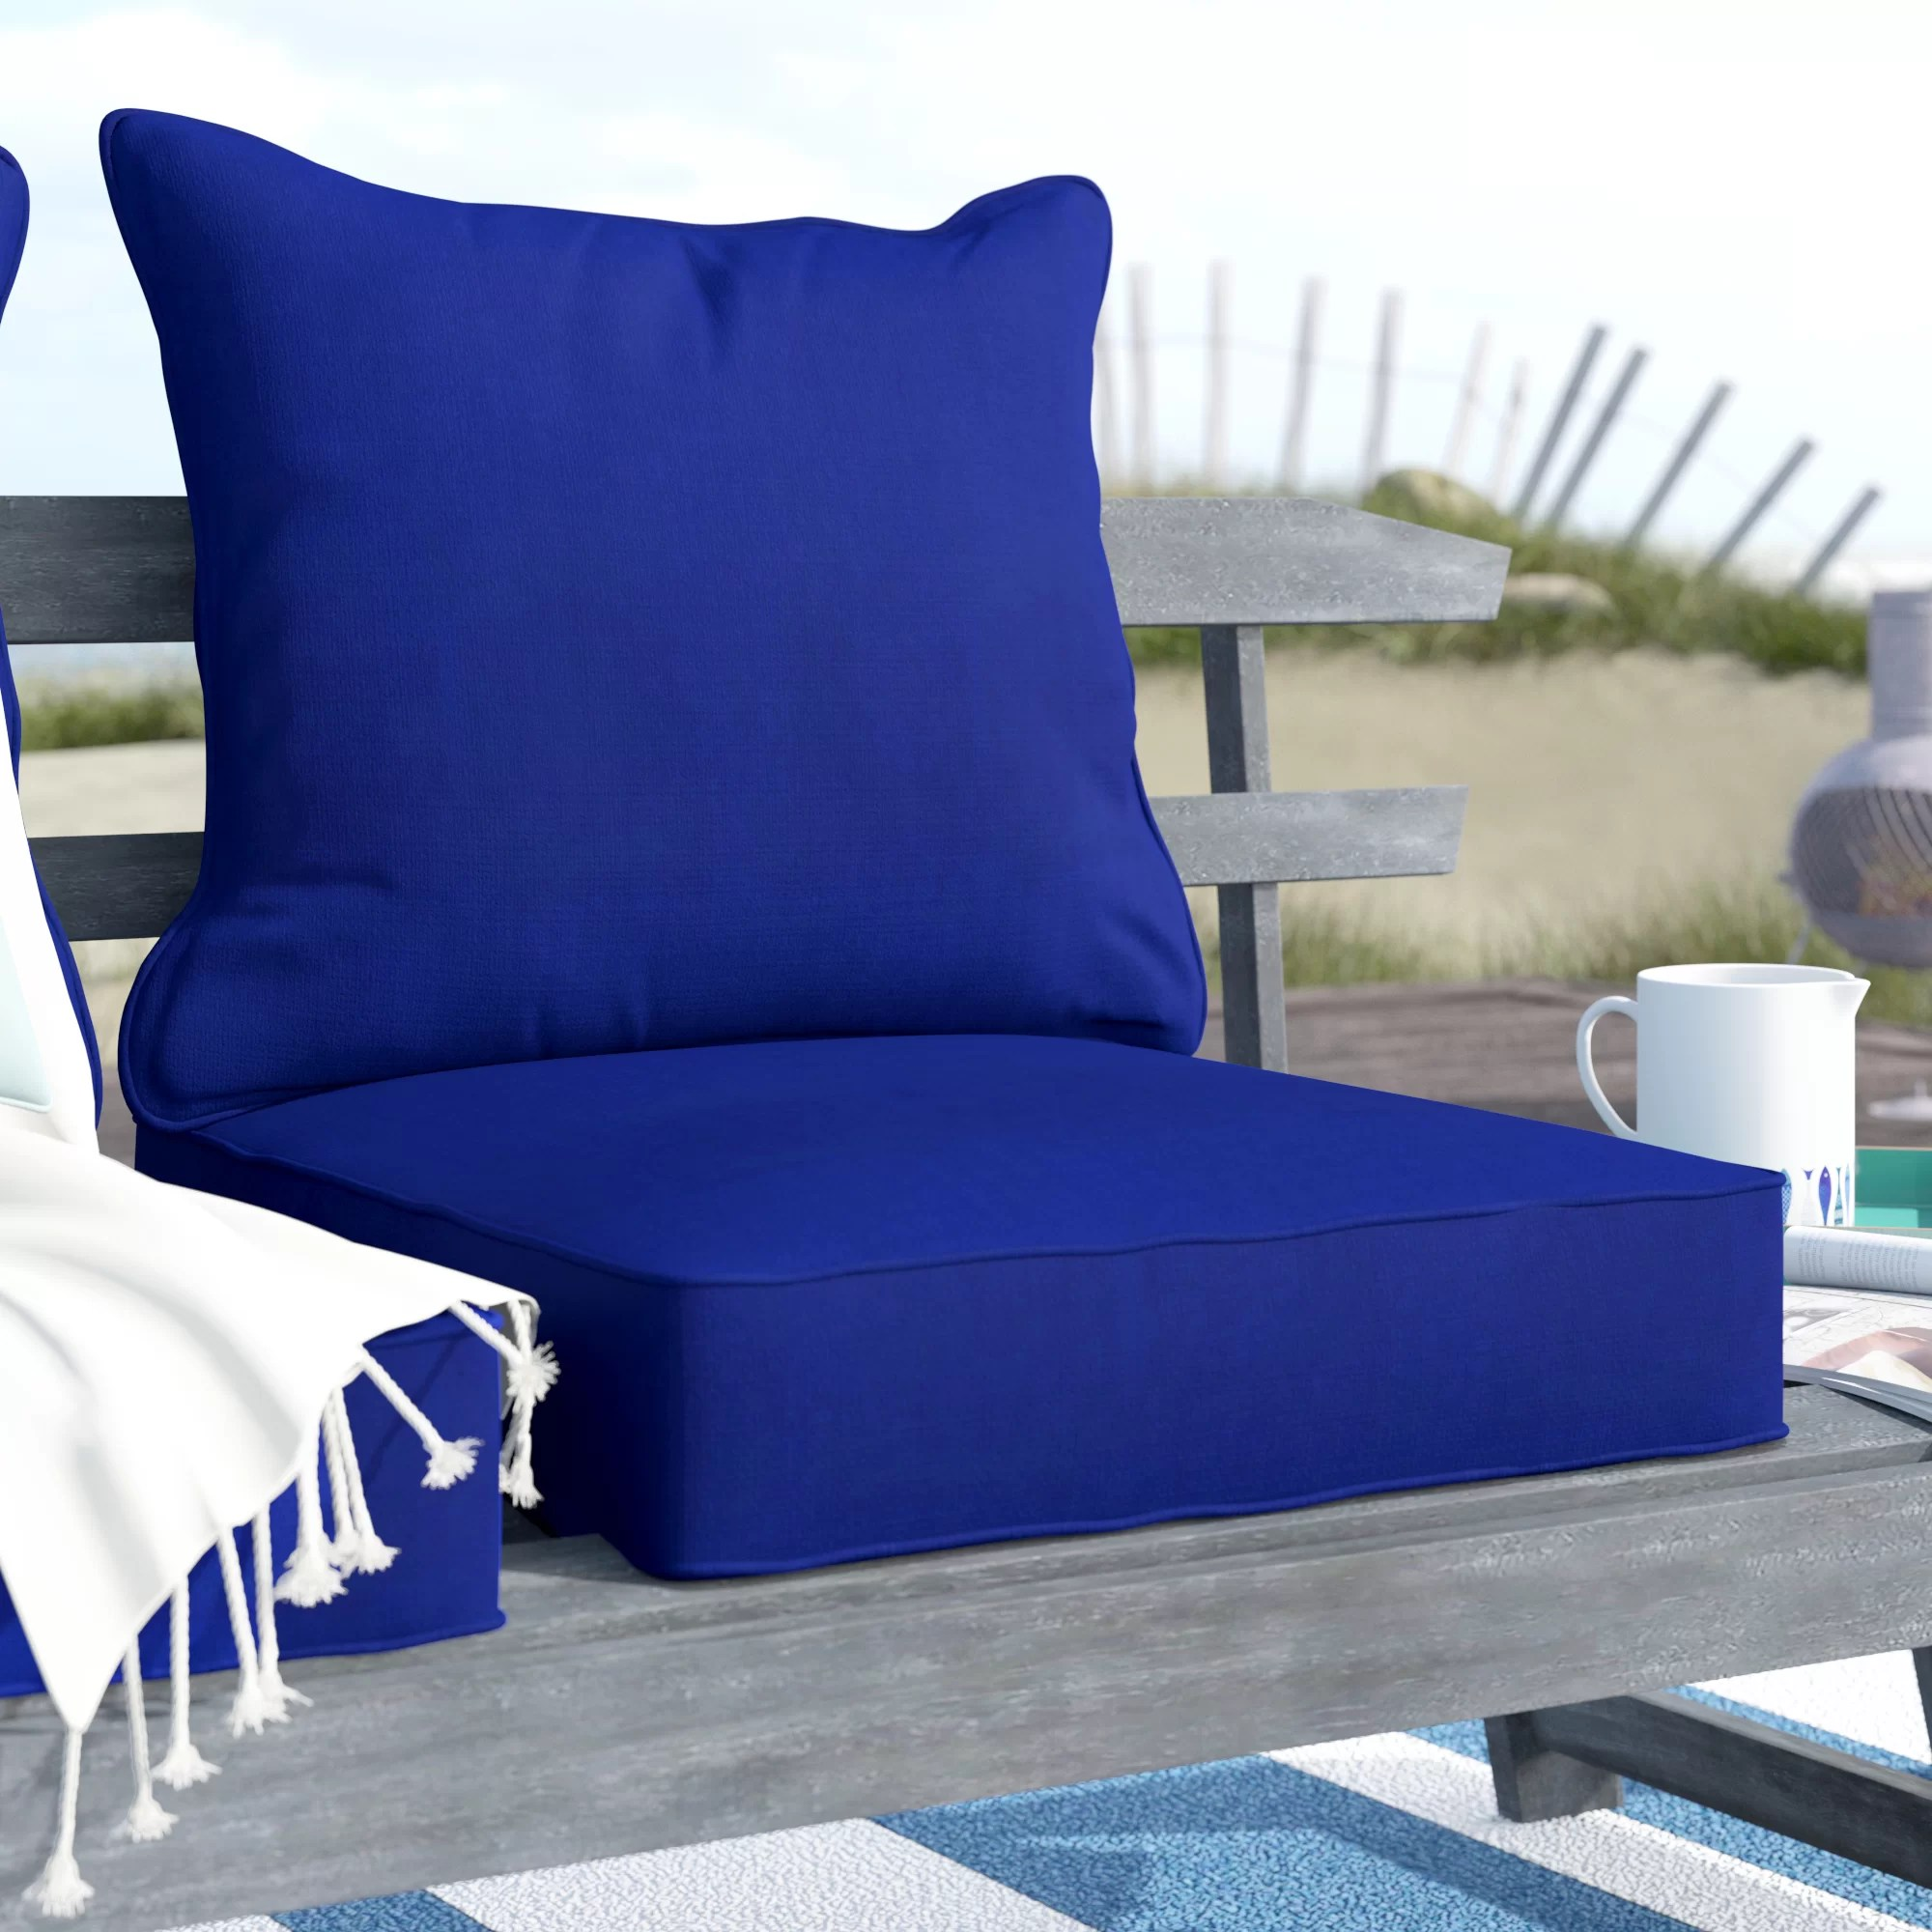 2 piece indoor outdoor chair cushion set